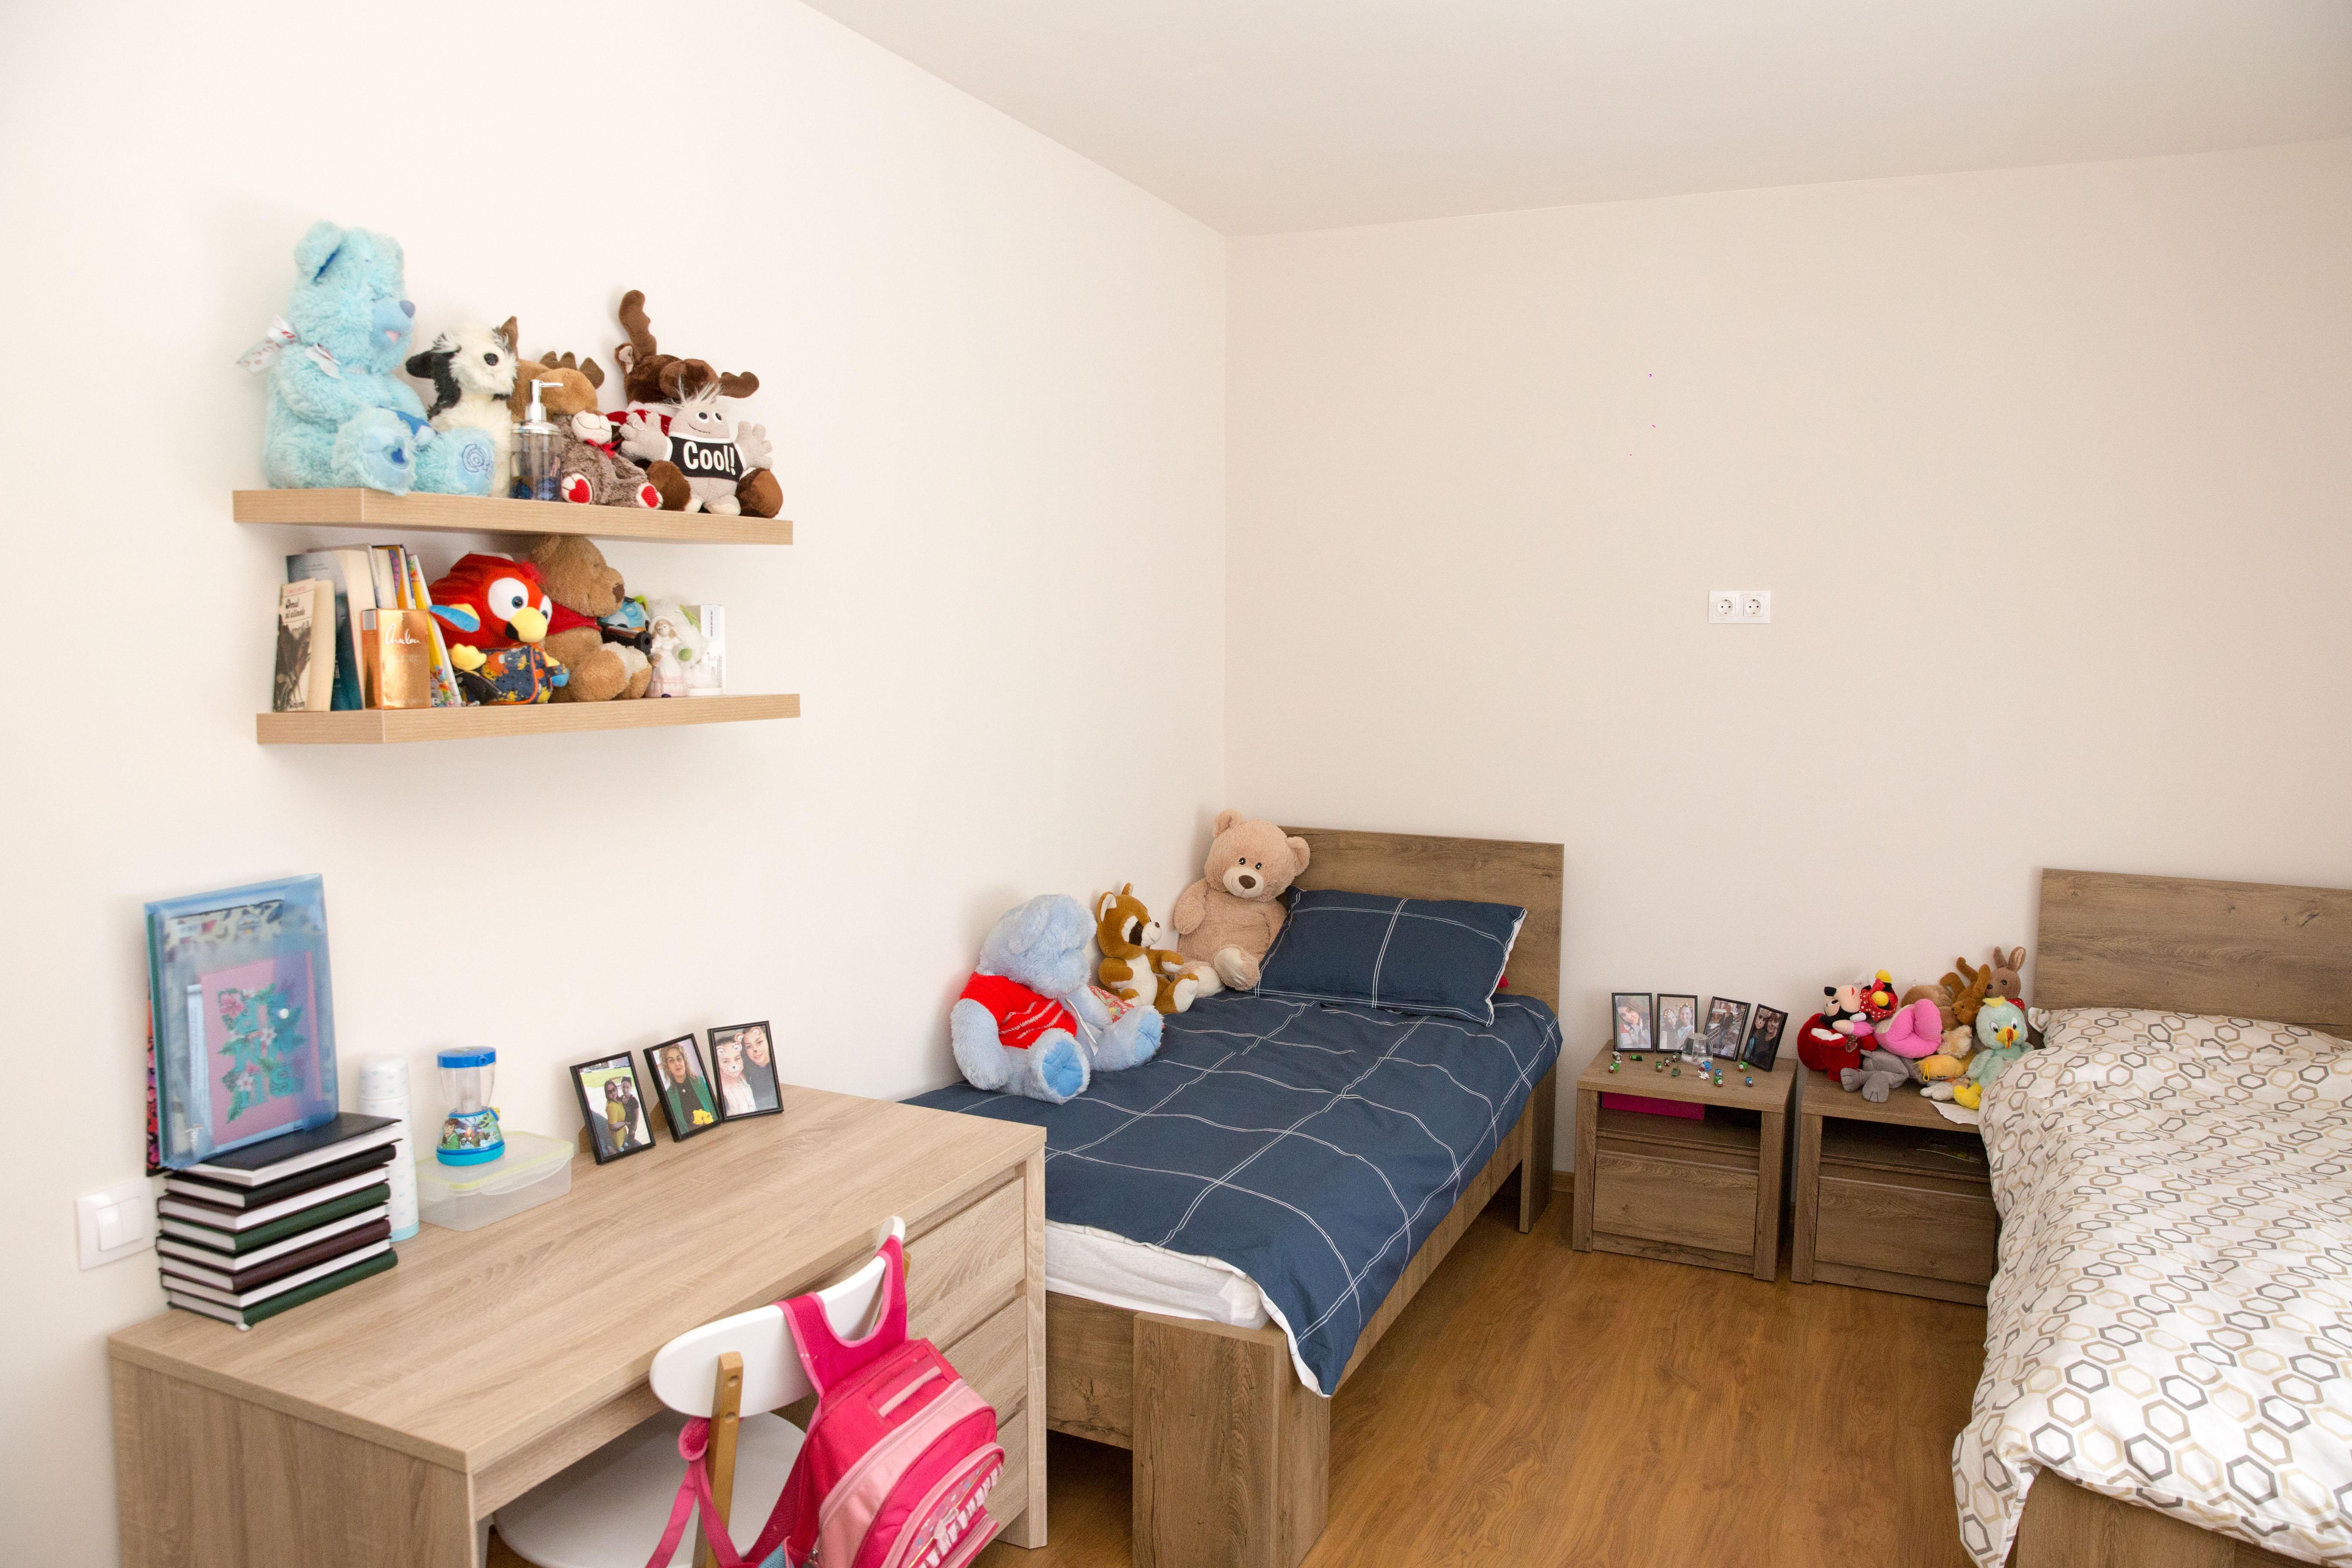 Sustinerea programului de dezinstitutionalizare prin constructia de case de tip familial – parteneriat intre Hope and Homes for Children si JYSK